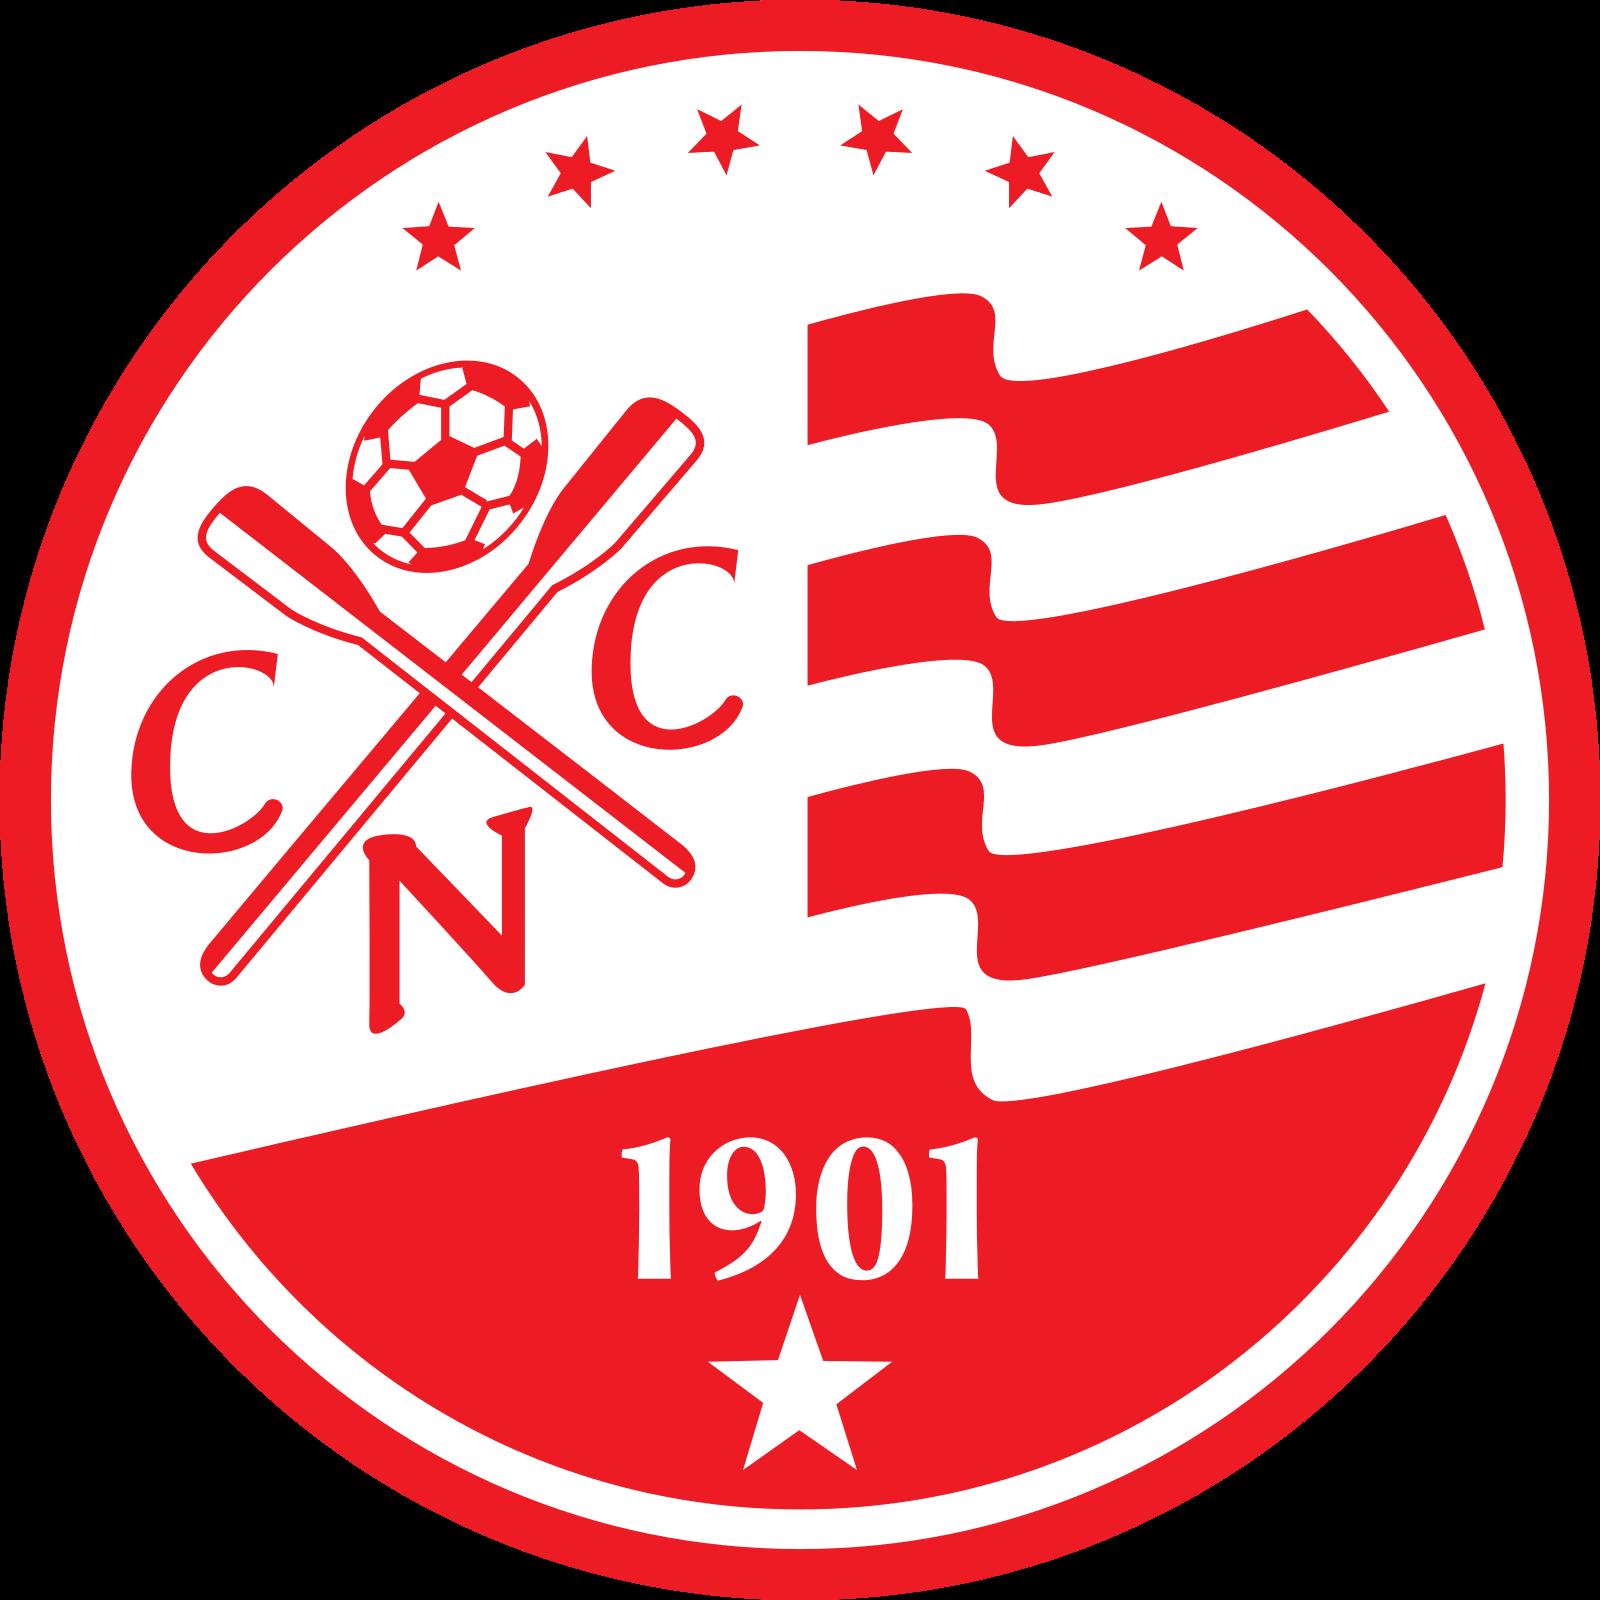 nautico logo escudo 2 - Náutico Logo - Escudo - Clube Náutico Capibaribe Logo - Escudo